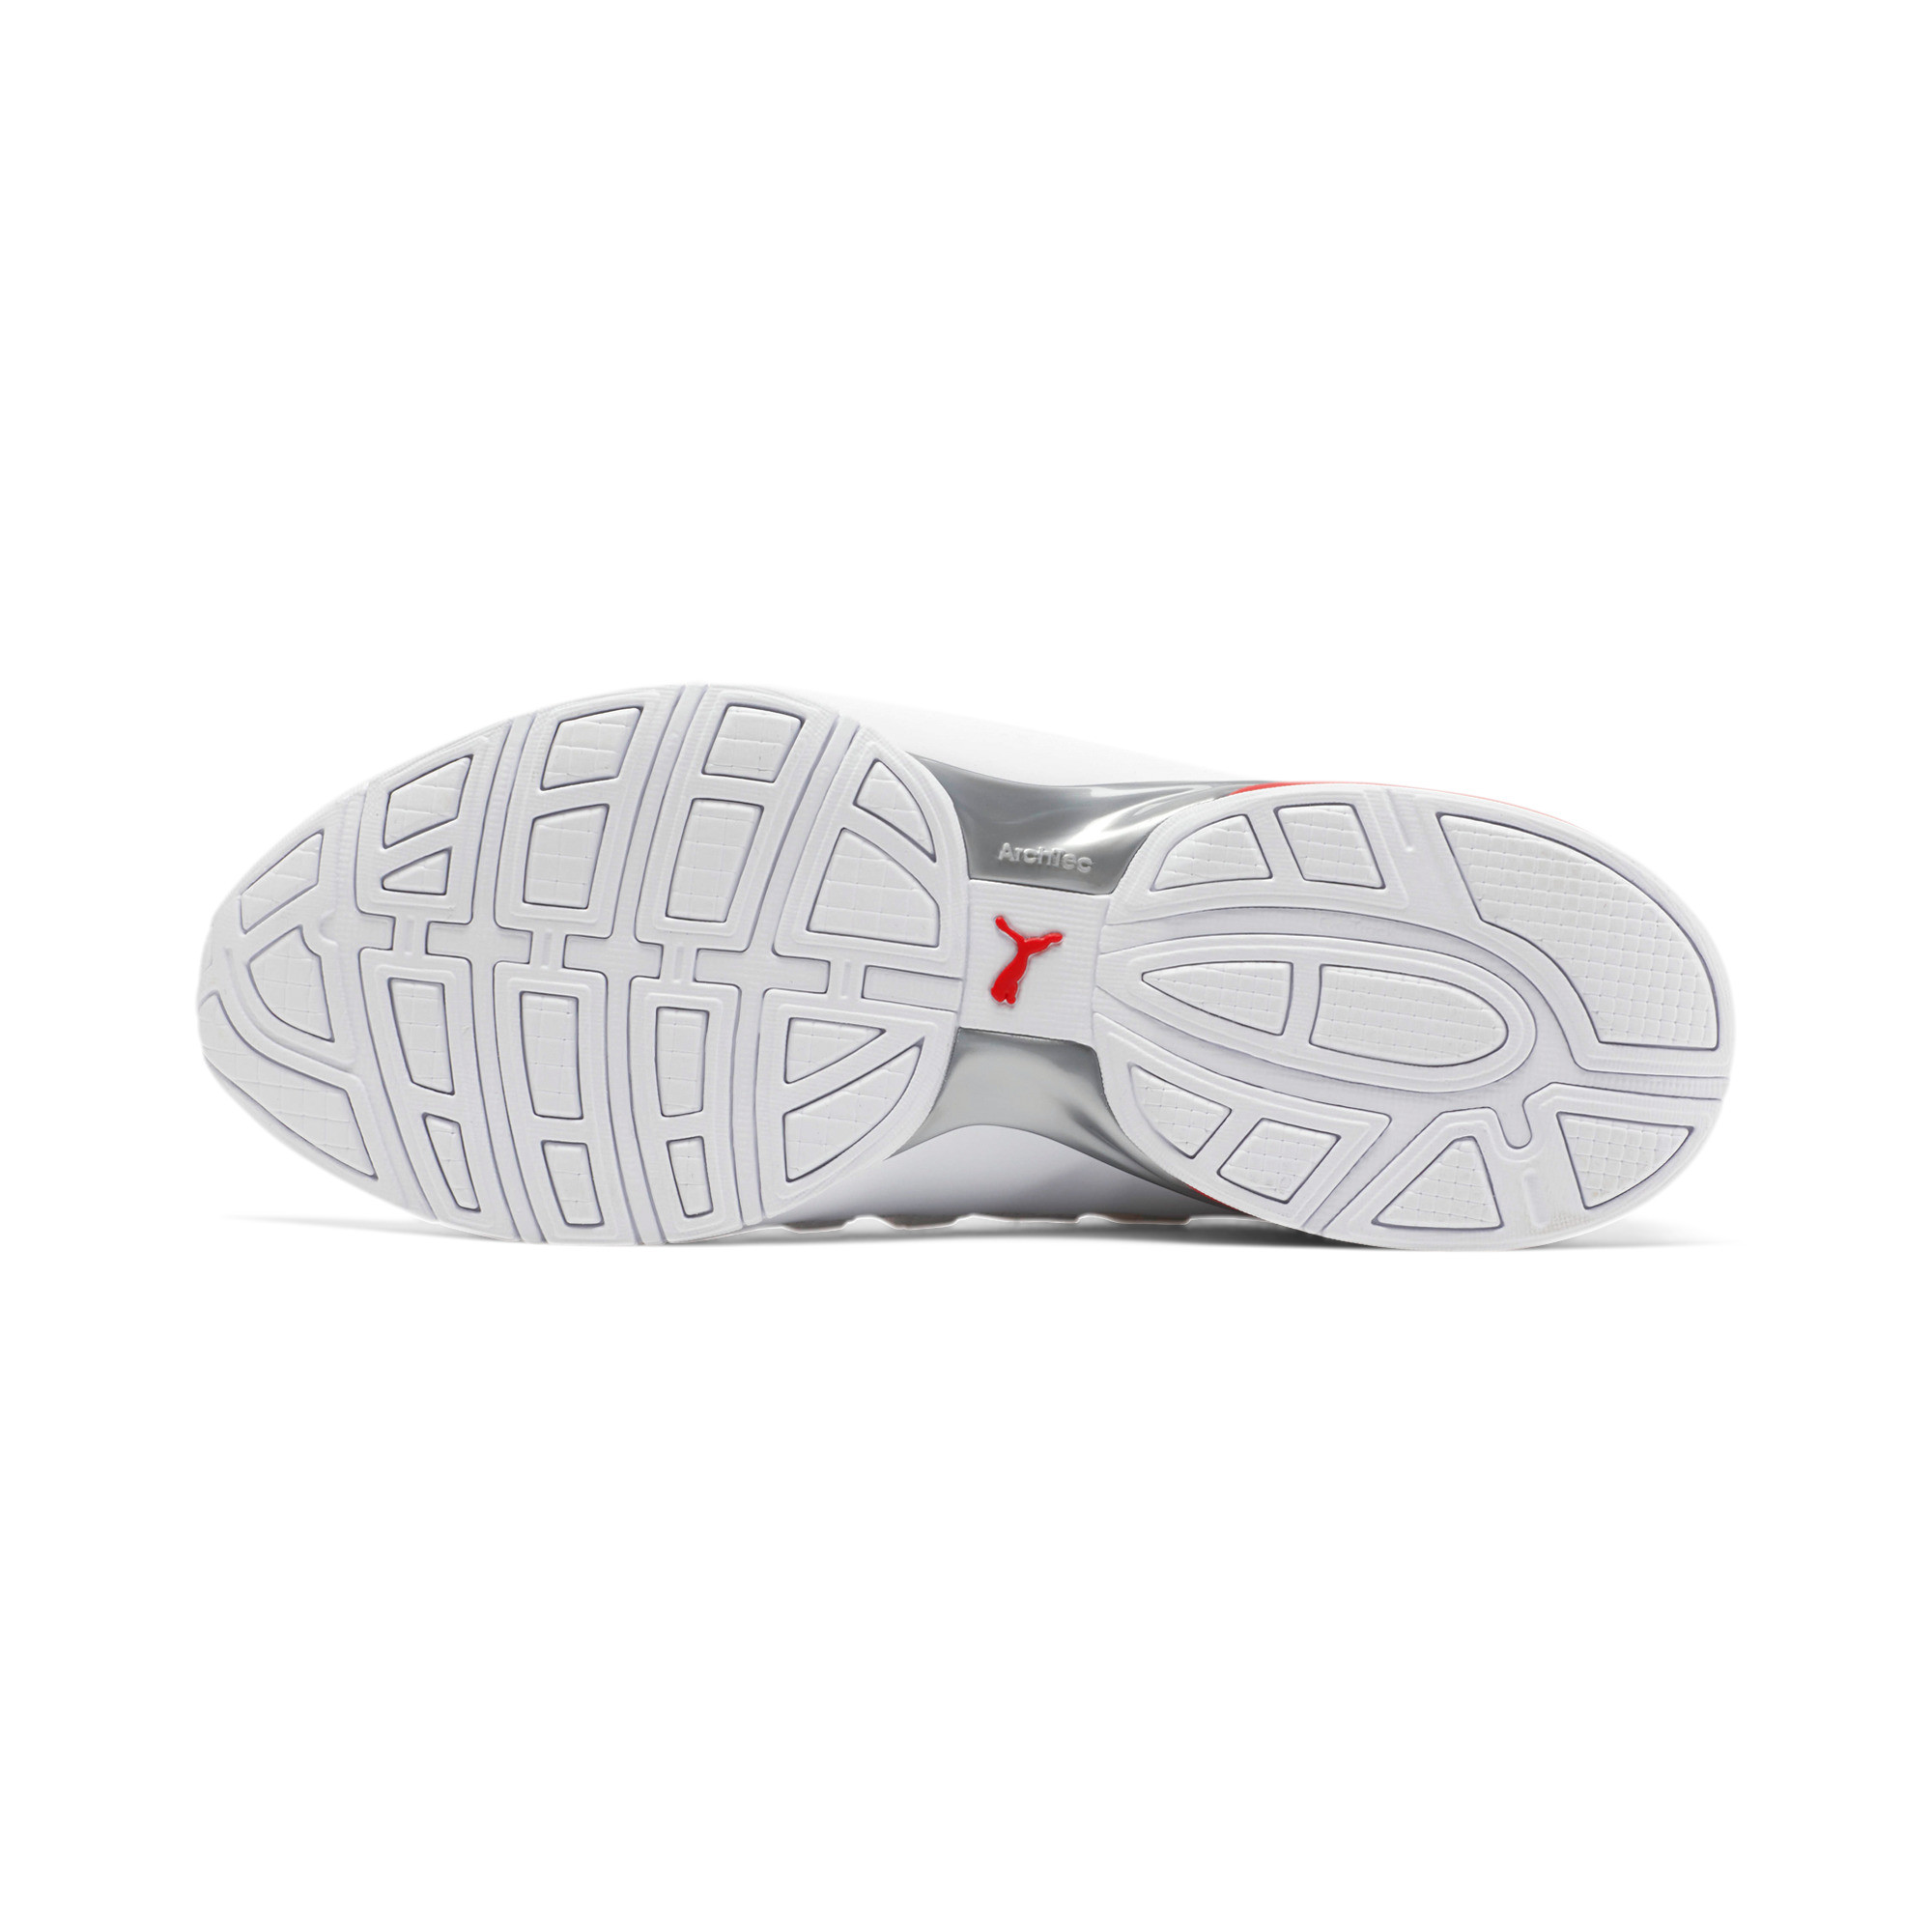 PUMA-Men-039-s-Momenta-Ripstop-Training-Shoes thumbnail 5